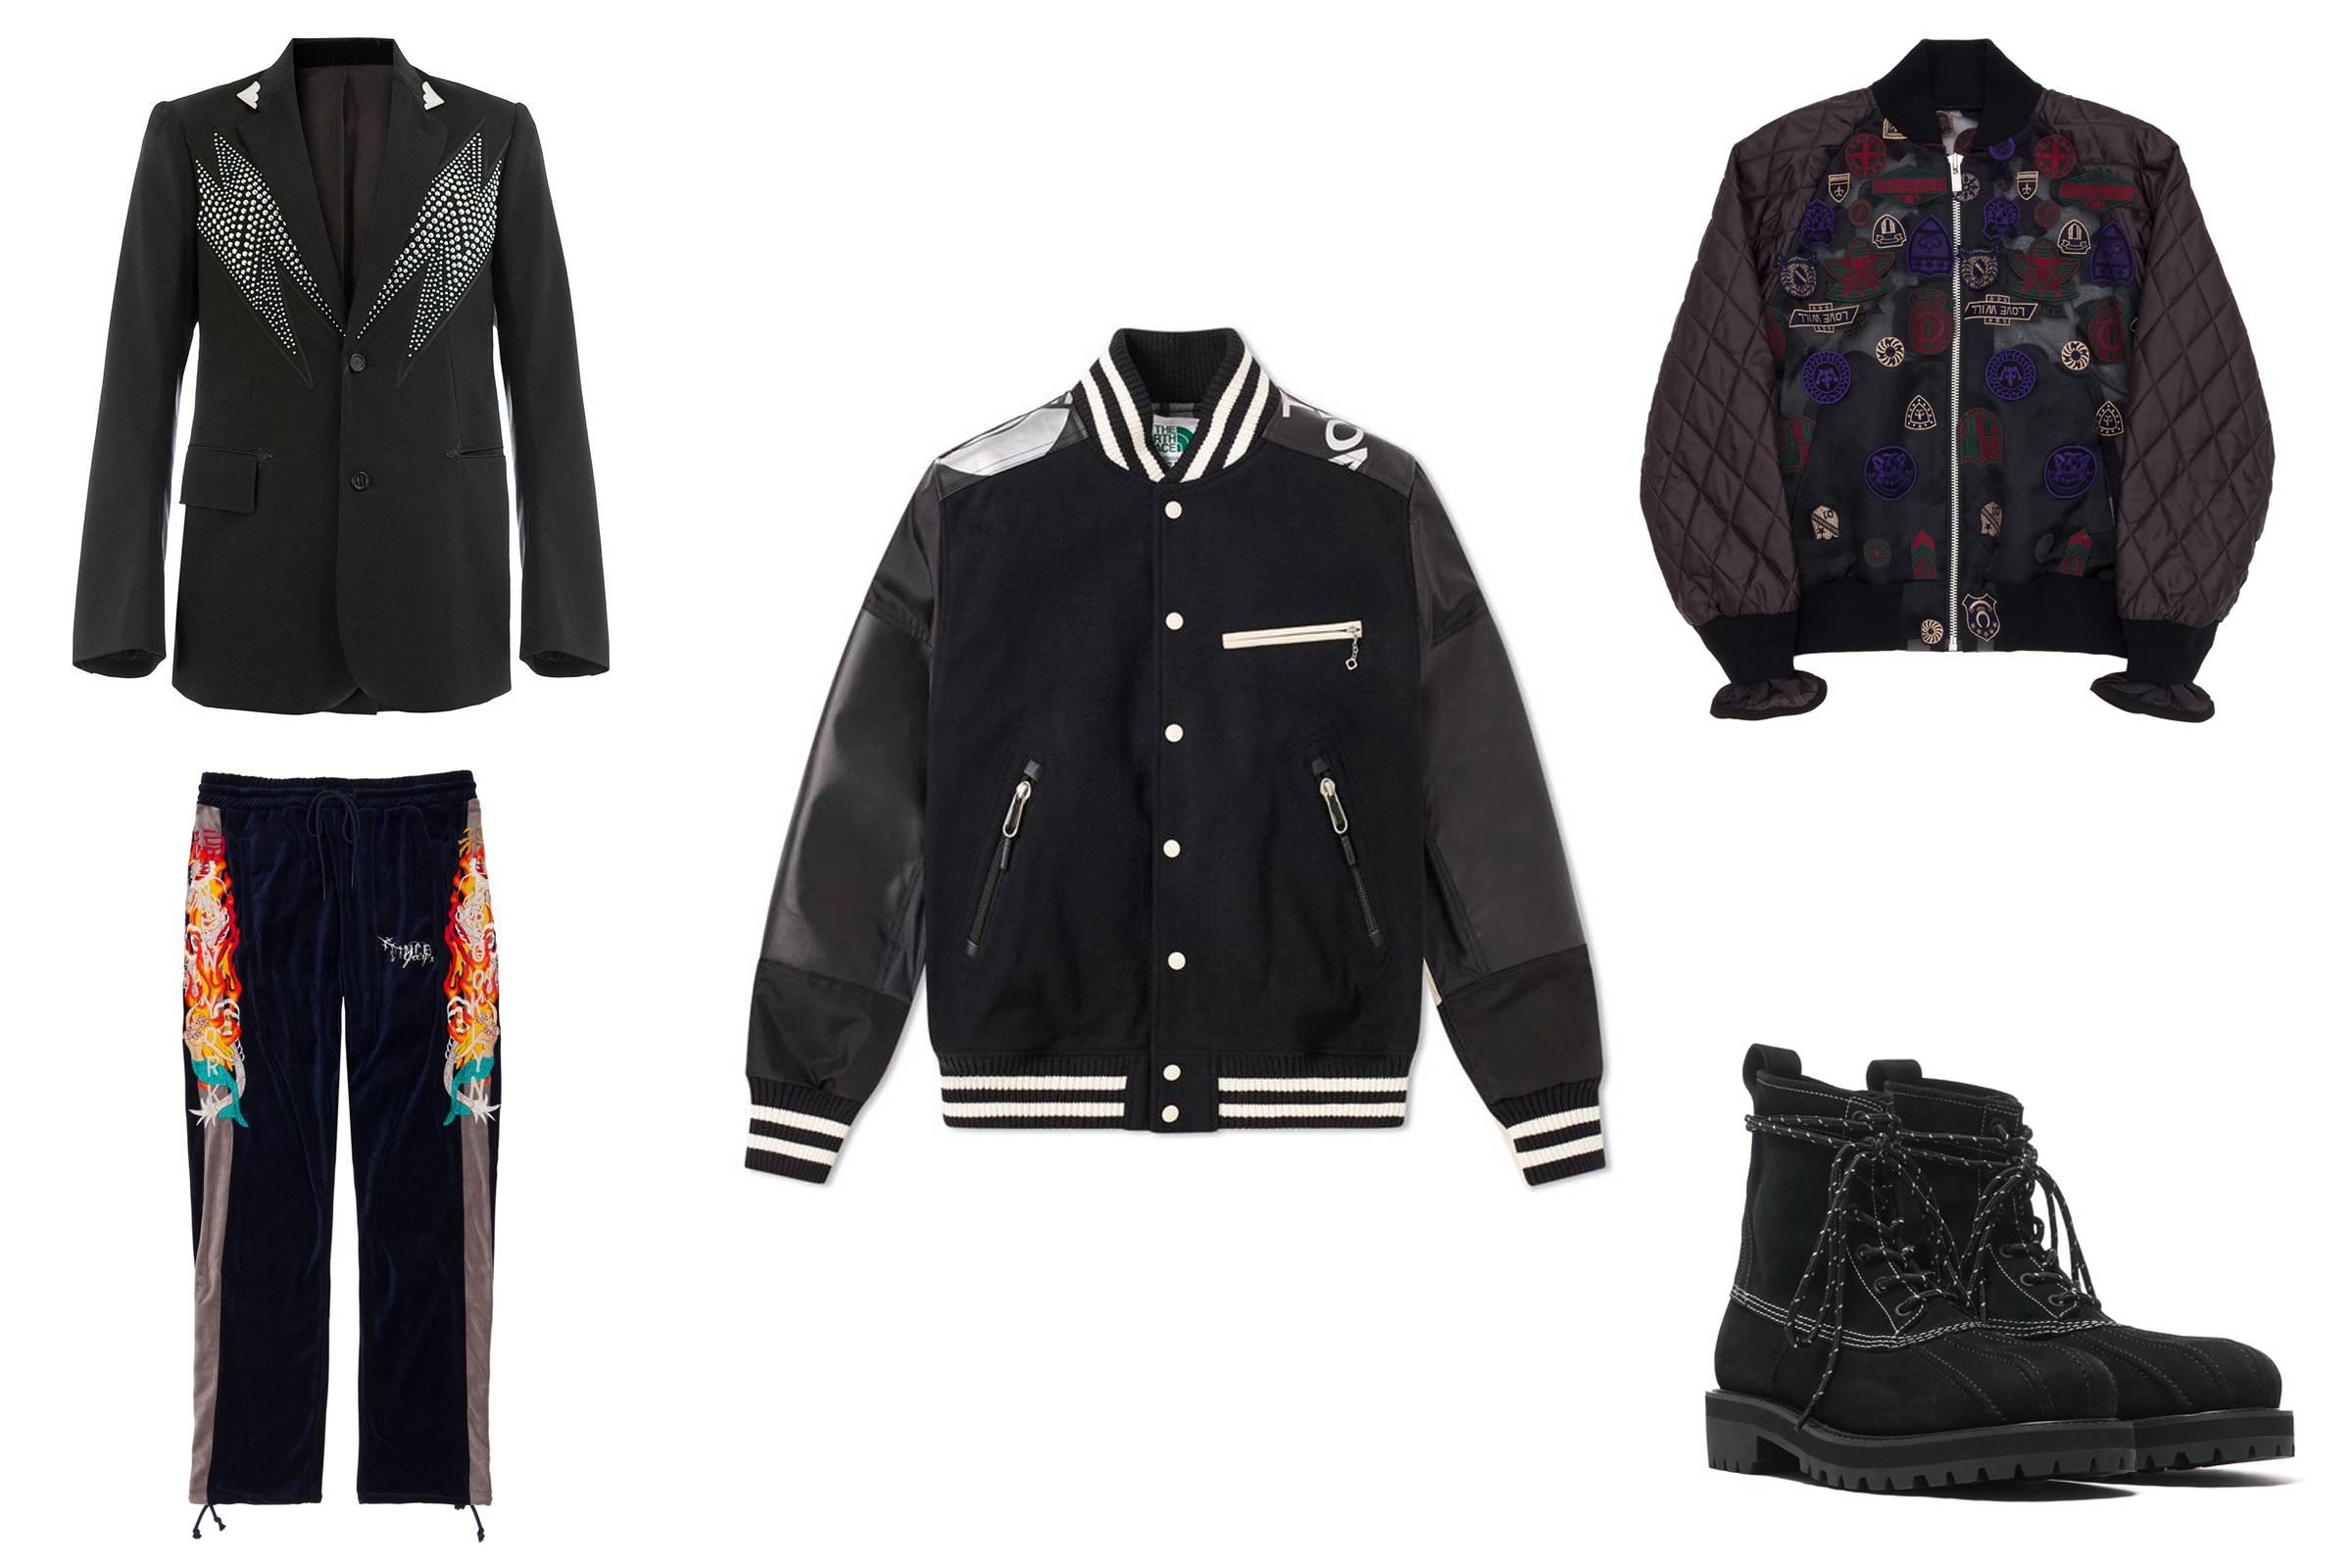 More Than Comme des Garçons: Level Up Your Japanese Designer Fashion